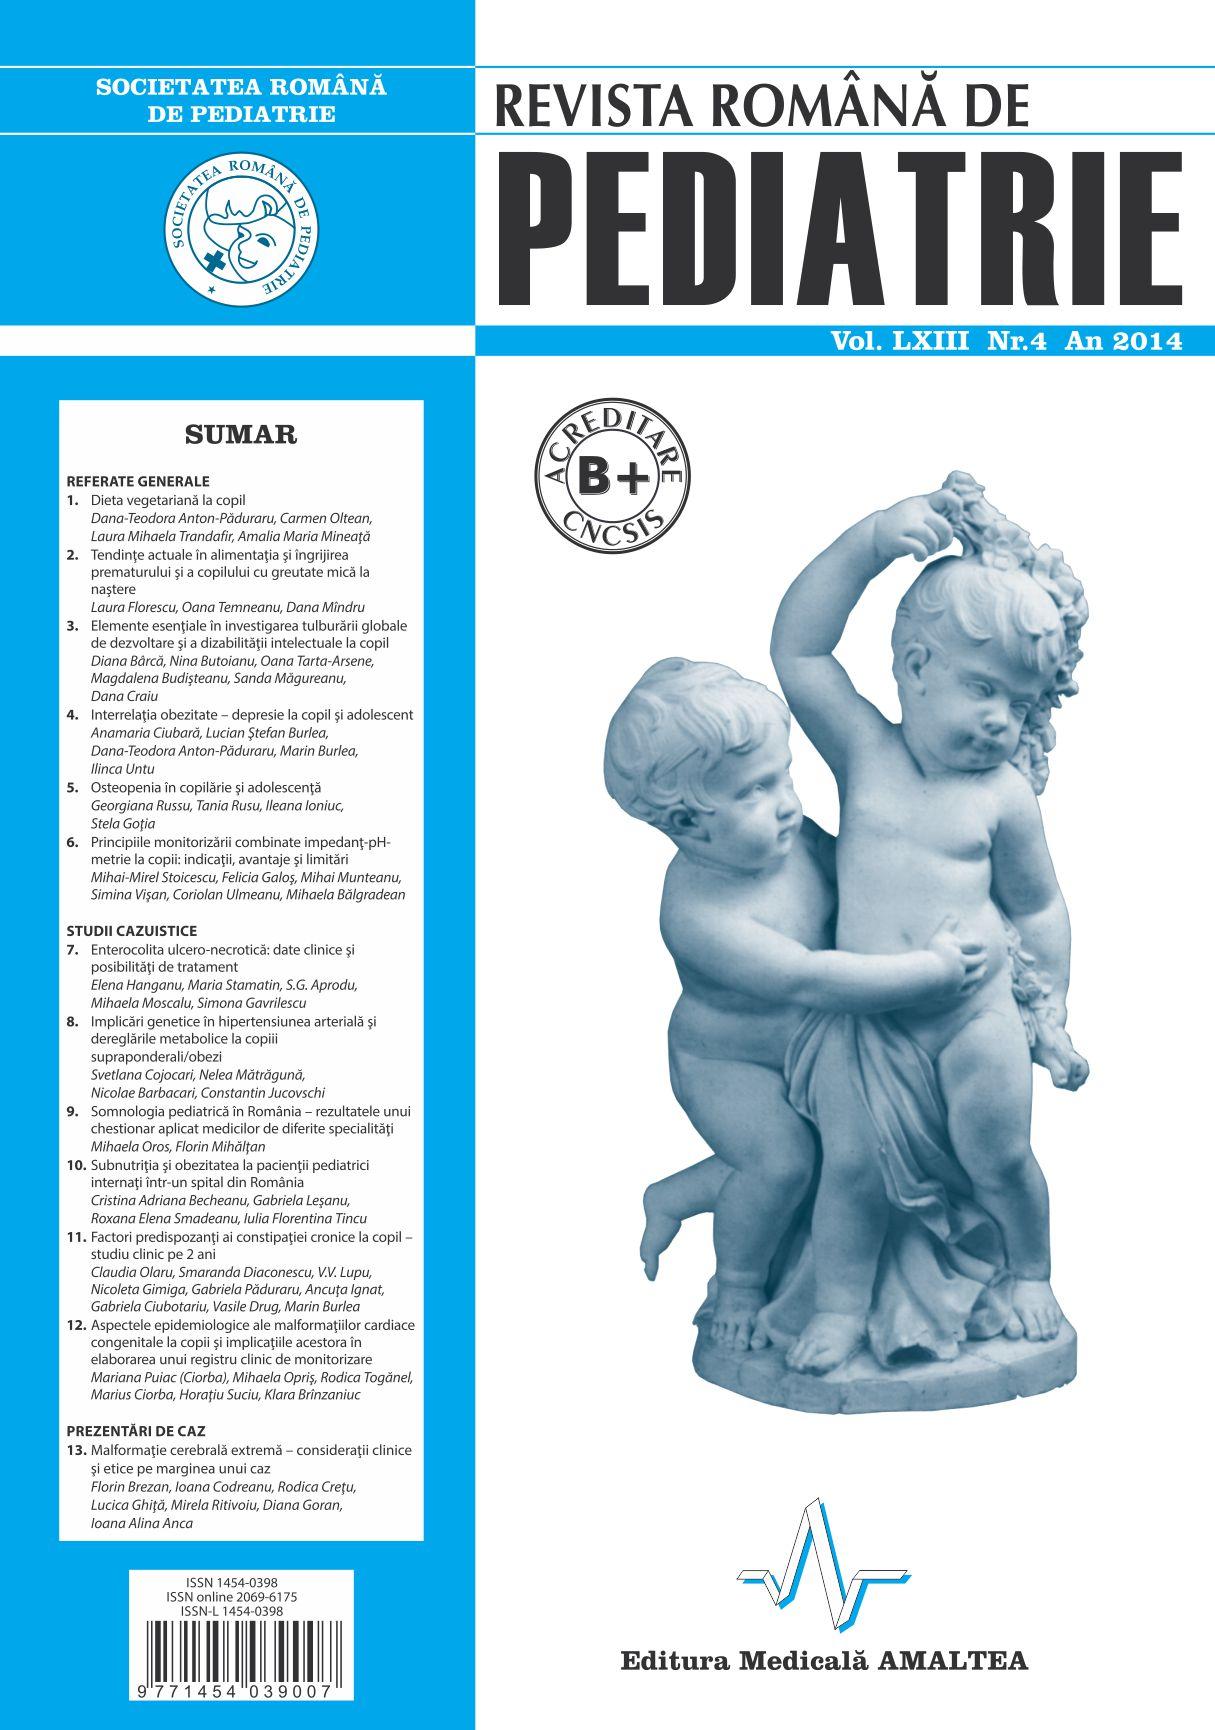 Revista Romana de PEDIATRIE | Volumul LXIII, No. 4, Year 2014